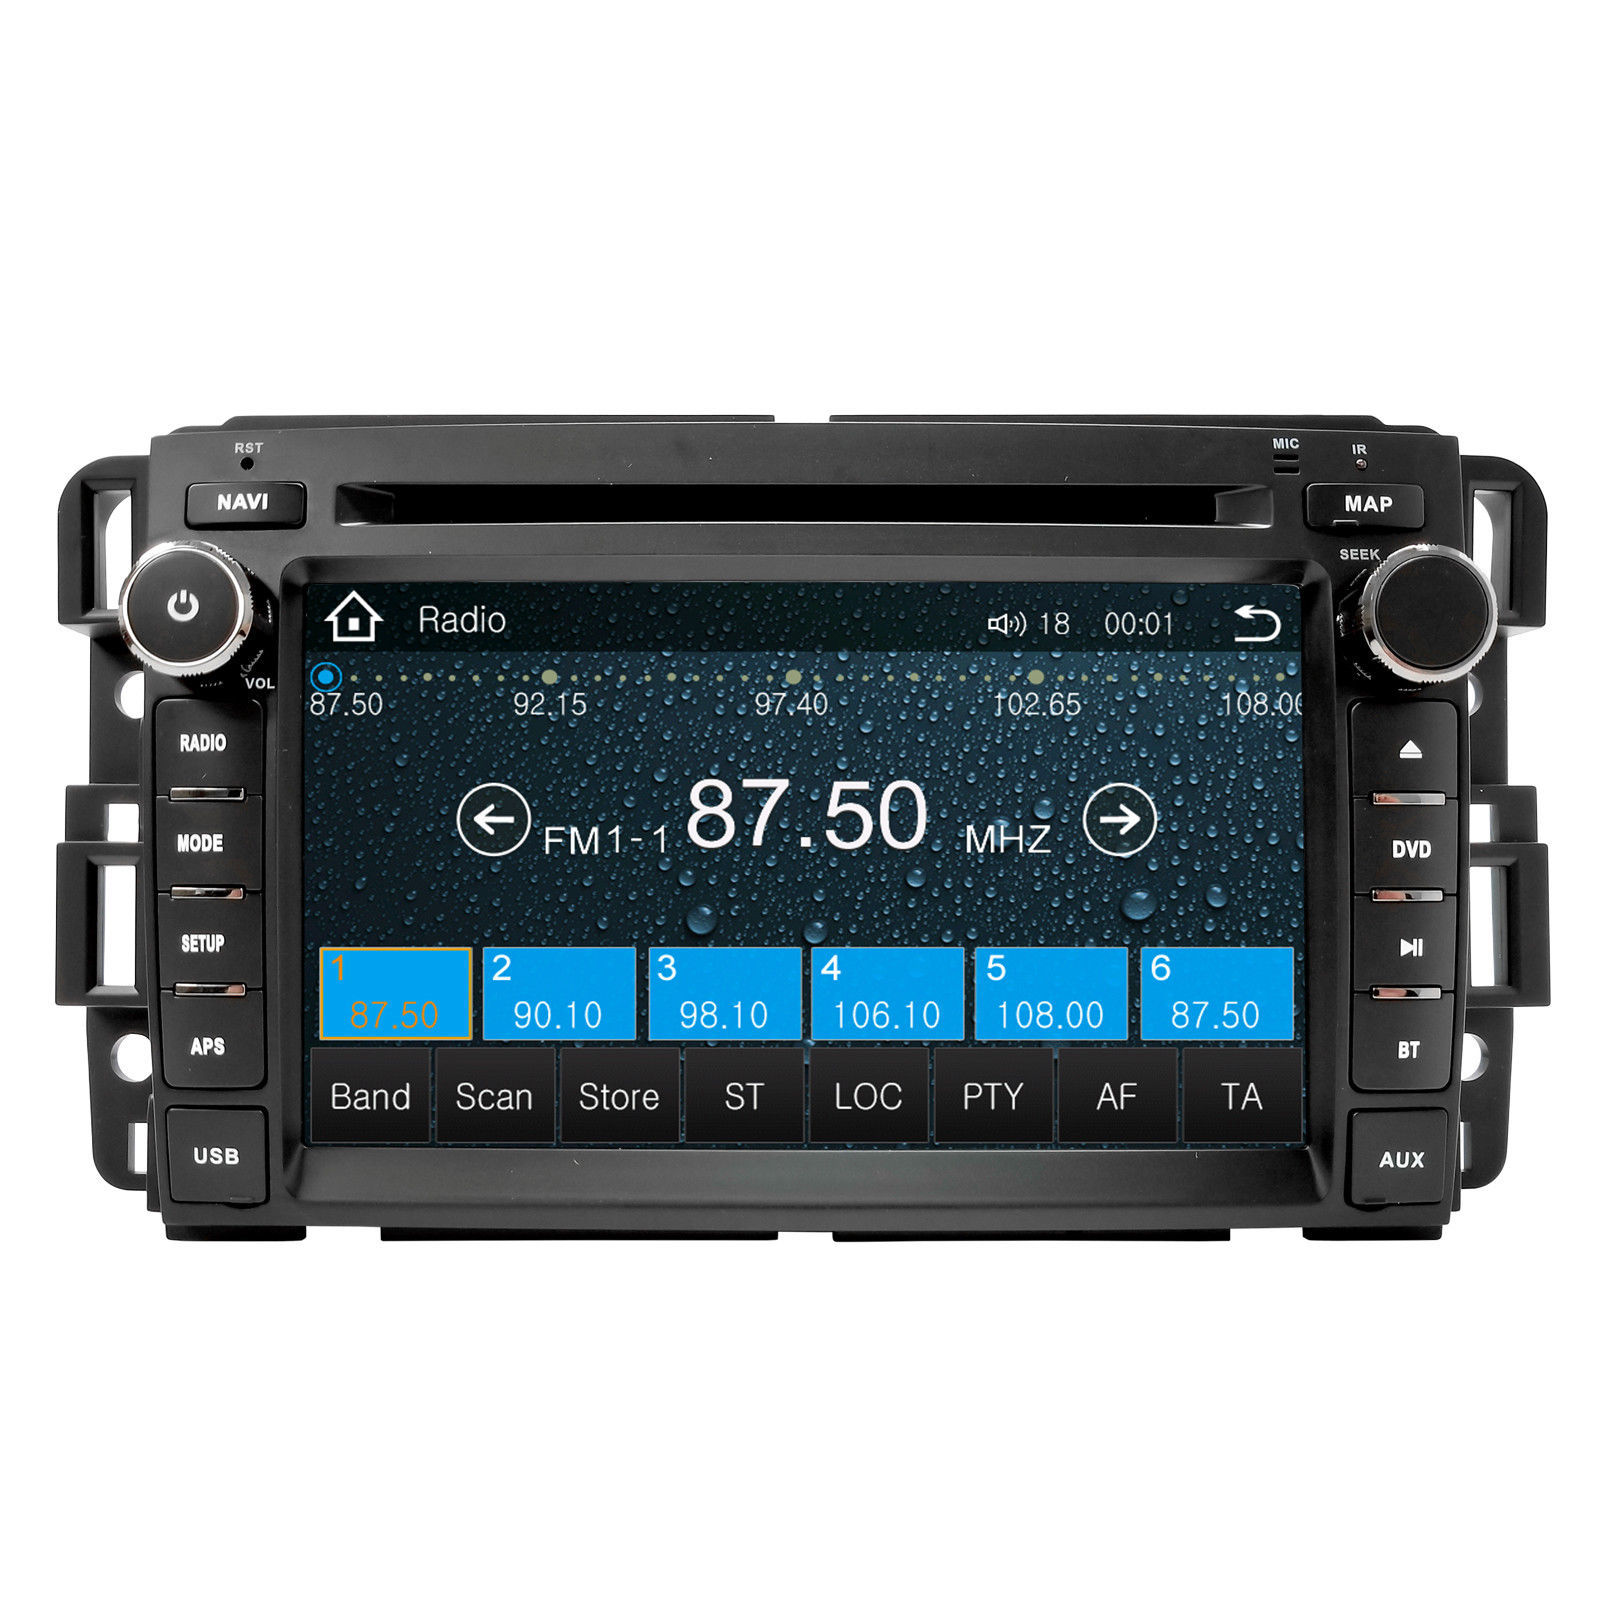 DVD Navigation Touchscreen Multimedia Radio for 2008 GMC Denali image 3